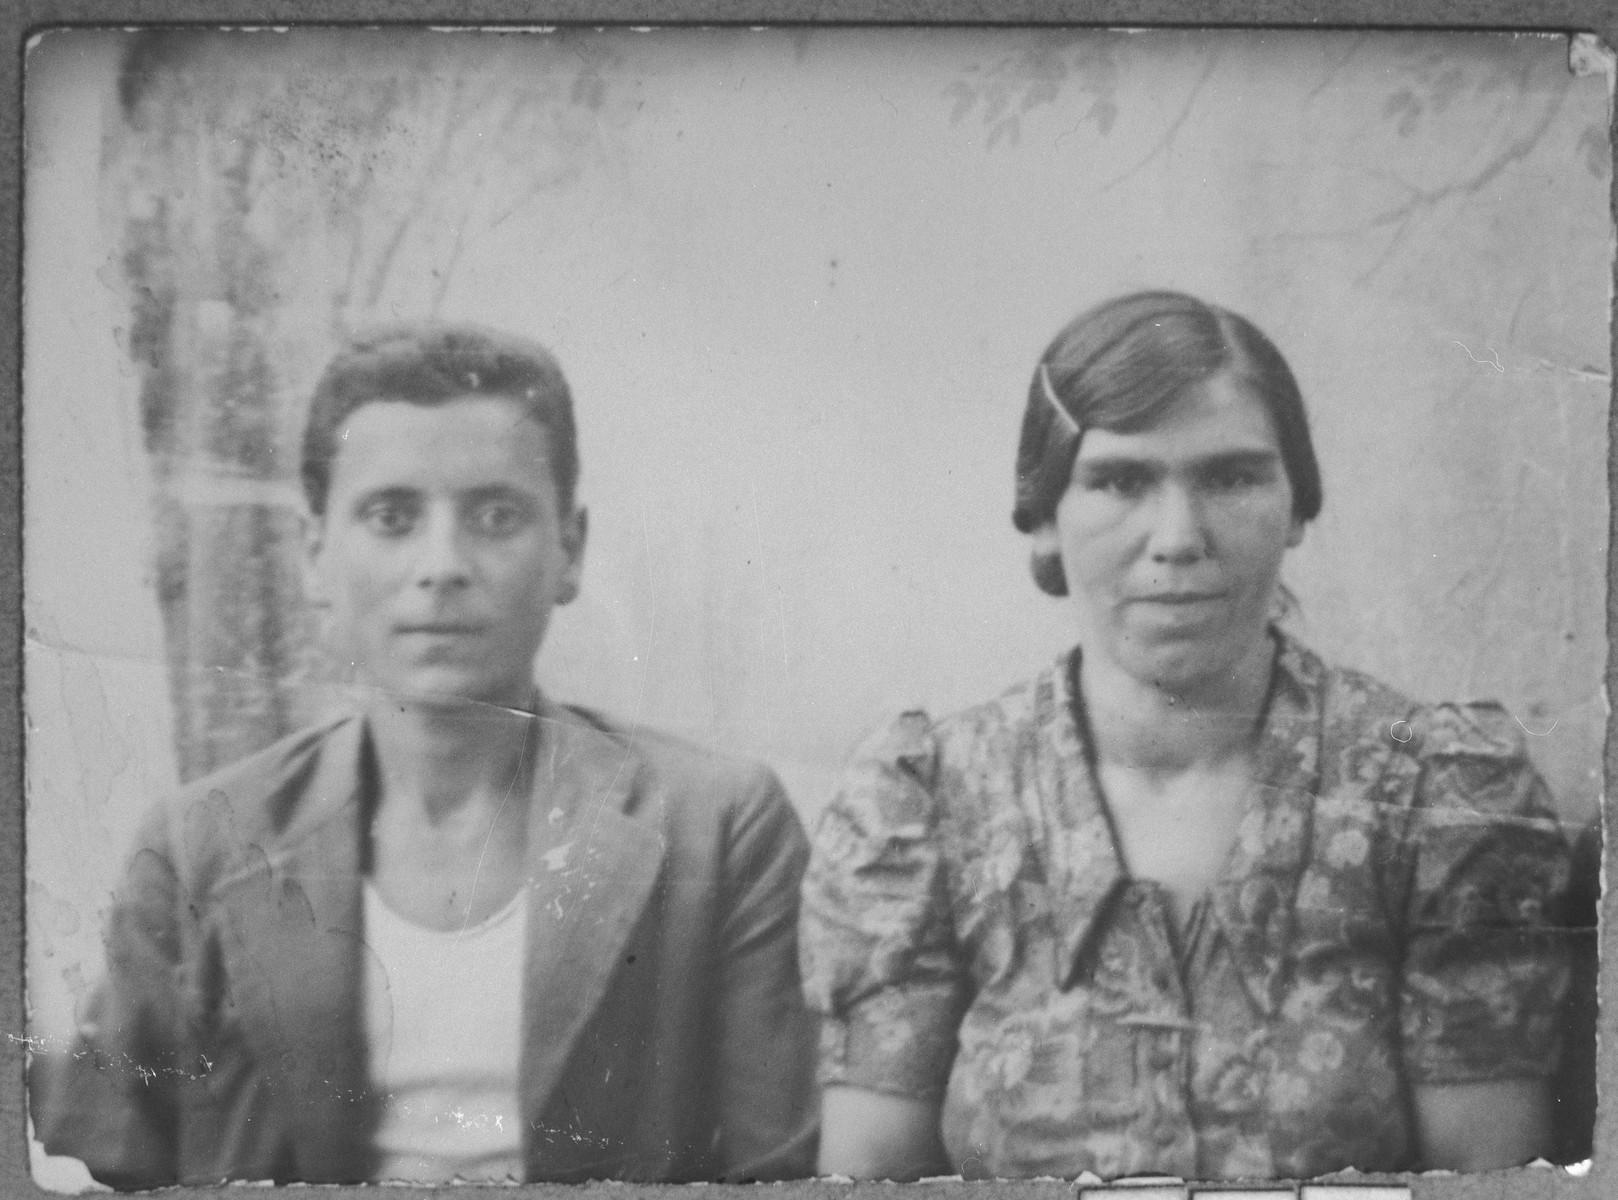 Portrait of Luna Sadikario, wife of Avram Sadikario, and Avram's son, Yosef.  Yosef was a laborer.  They lived at Krstitsa 30 in Bitola.